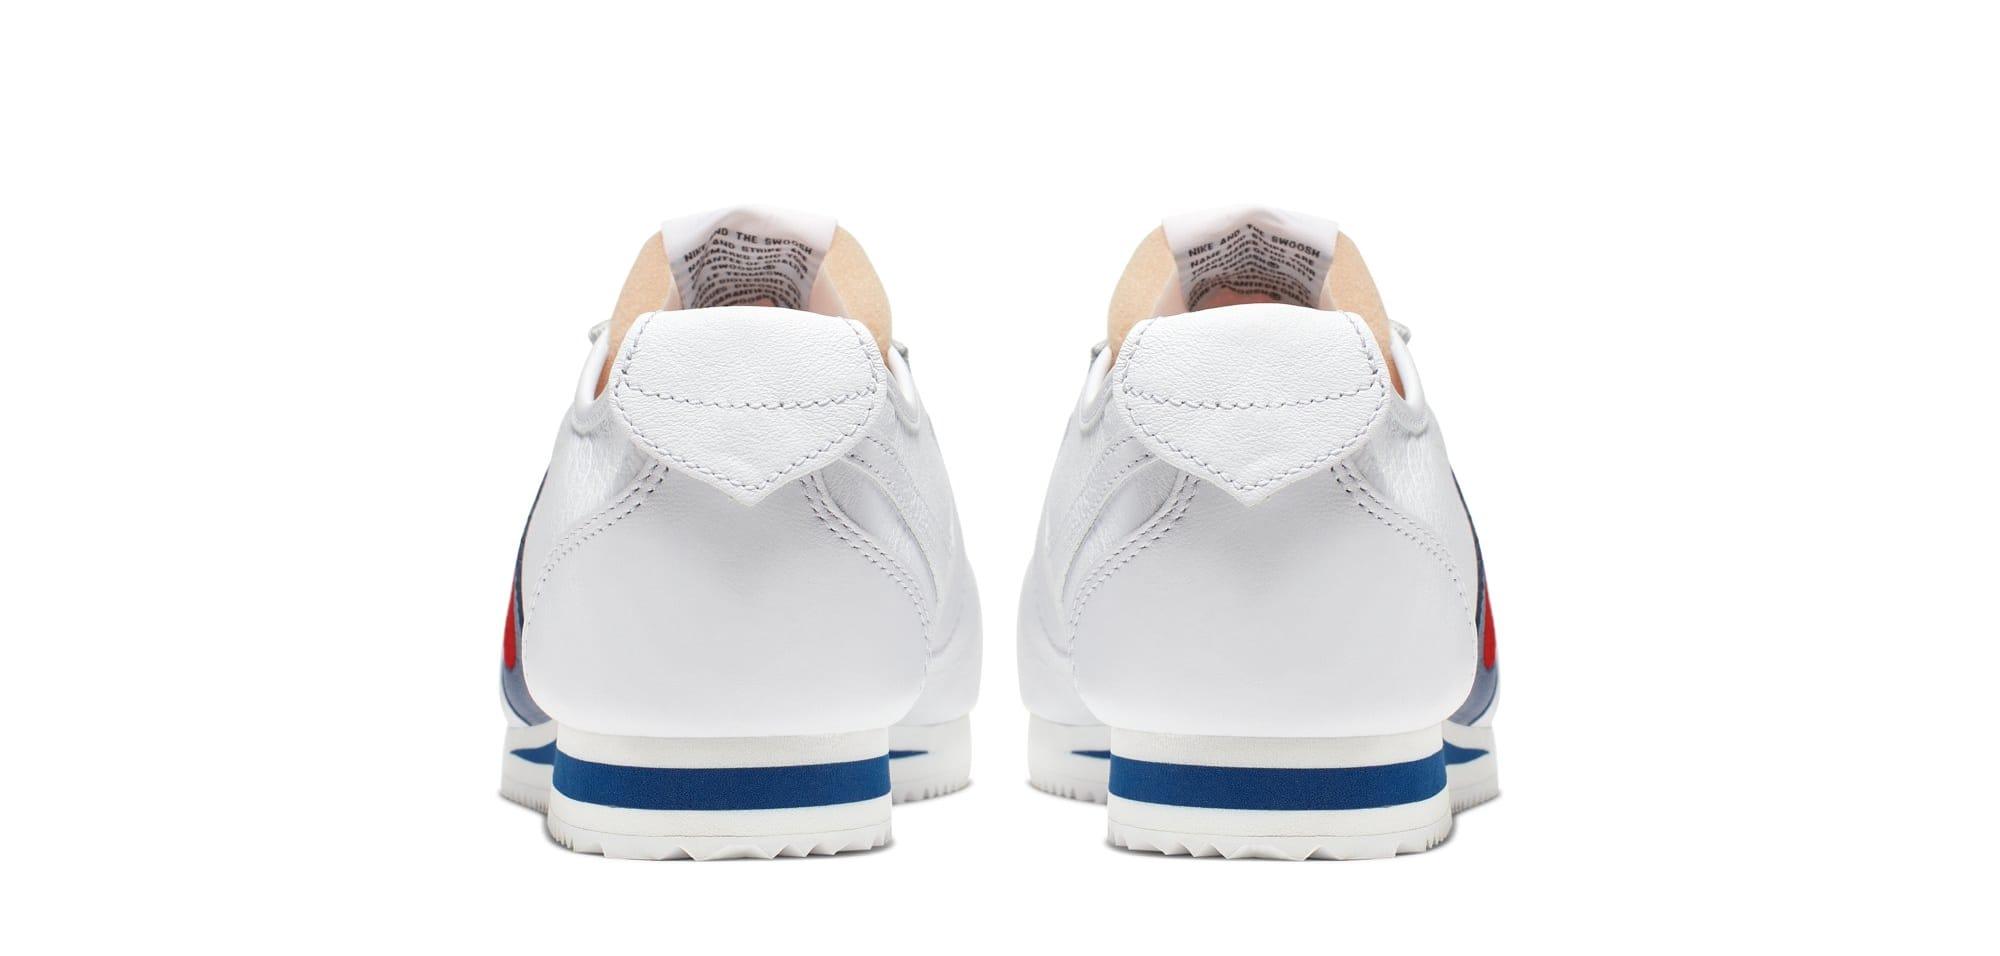 Nike Classic Cortez 'Shoe Dog Pack (Dimension Six)' CJ2586-101 (Sole)